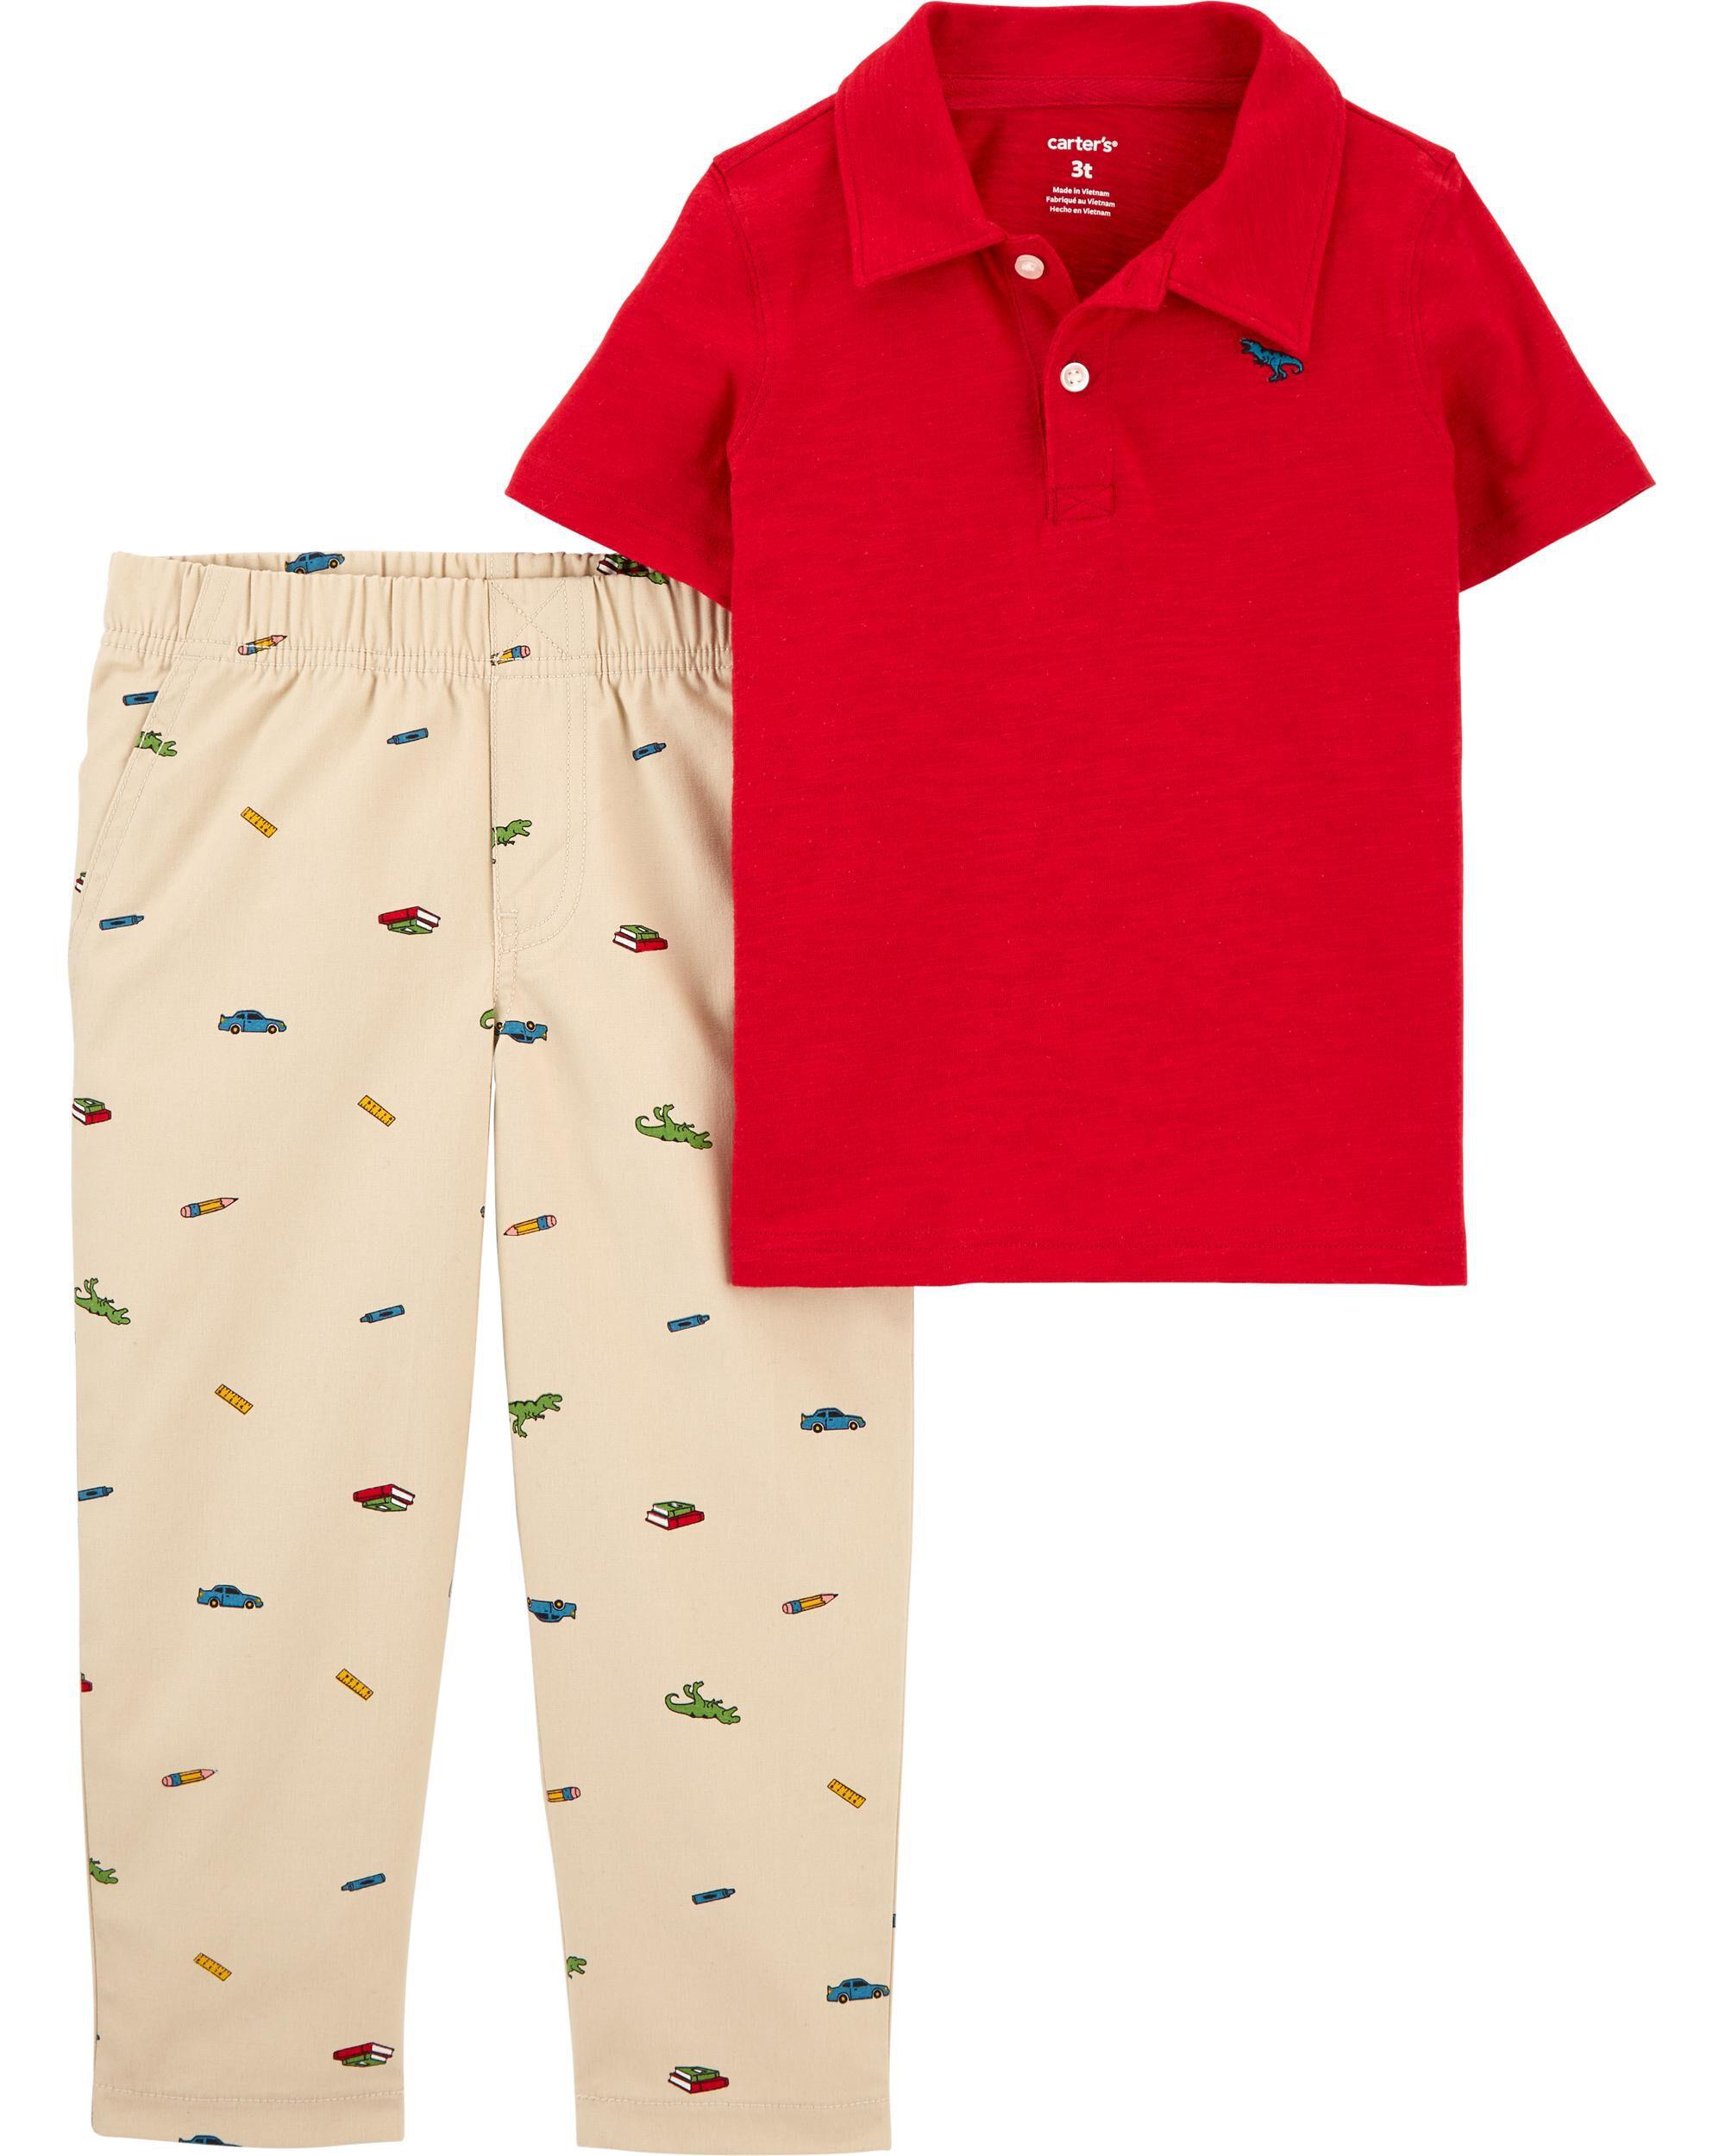 *CLEARANCE* 2-Piece Slub Jersey Polo & Schiffli Pant Set